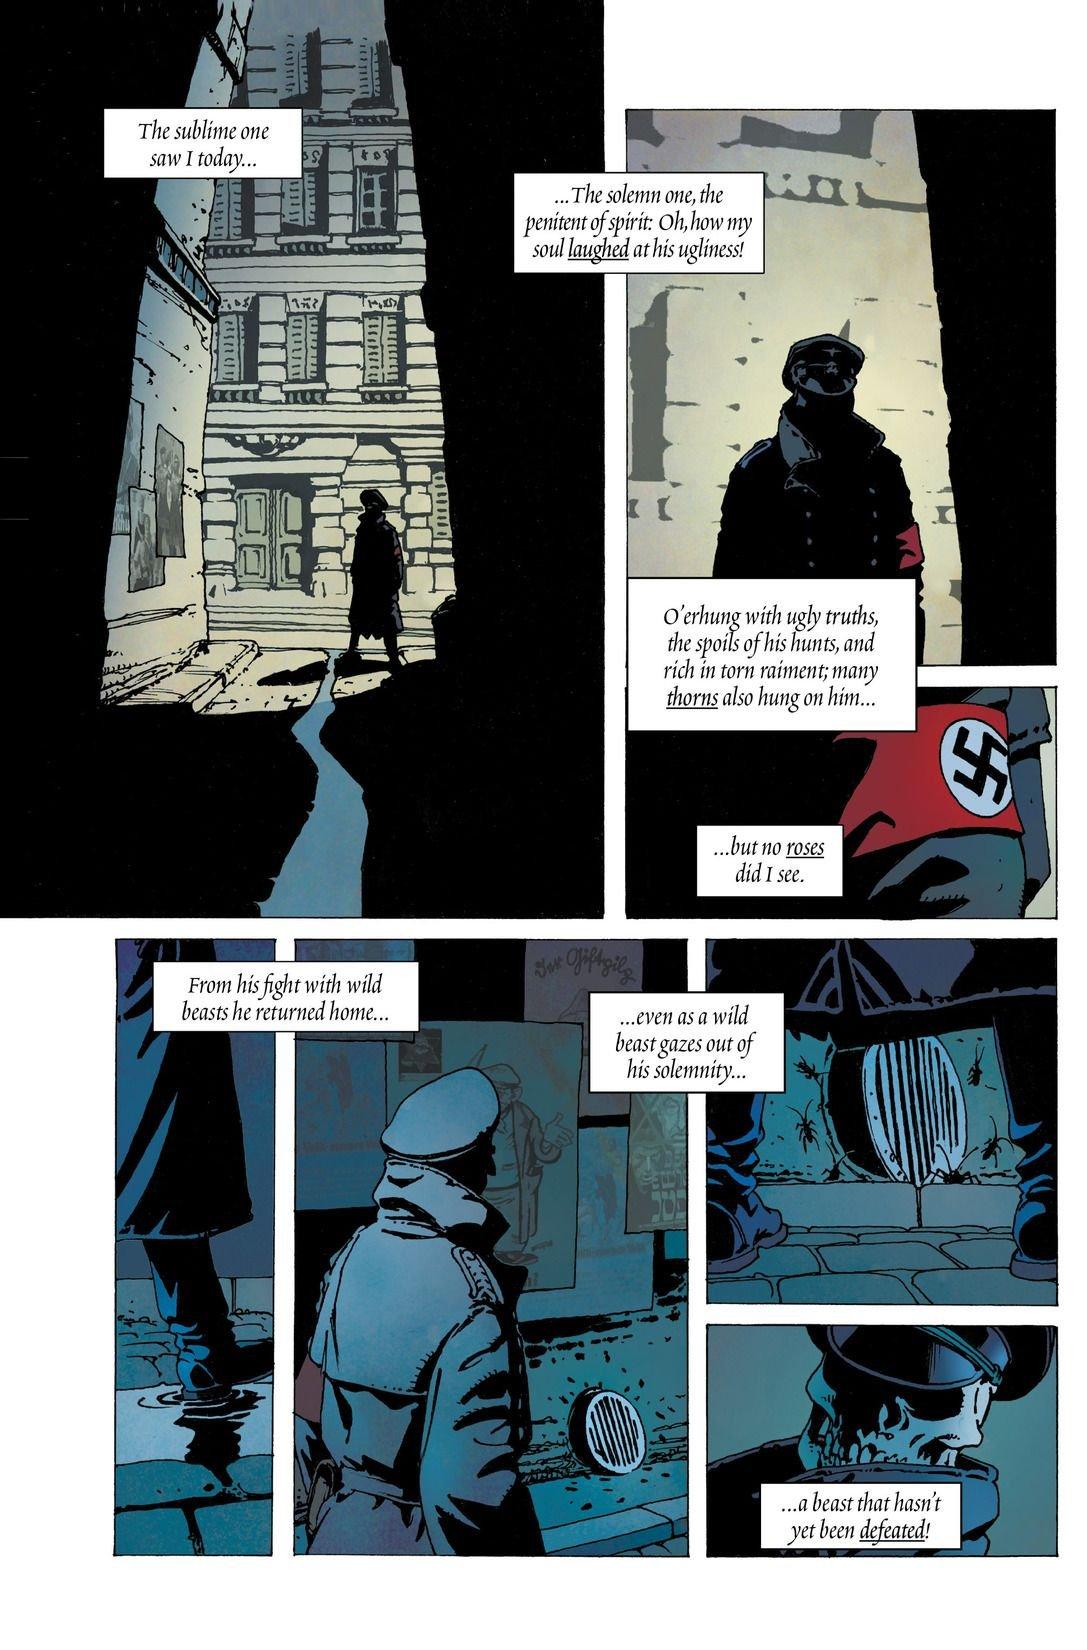 The Chimera Brigade #1 (Comic) Review 2